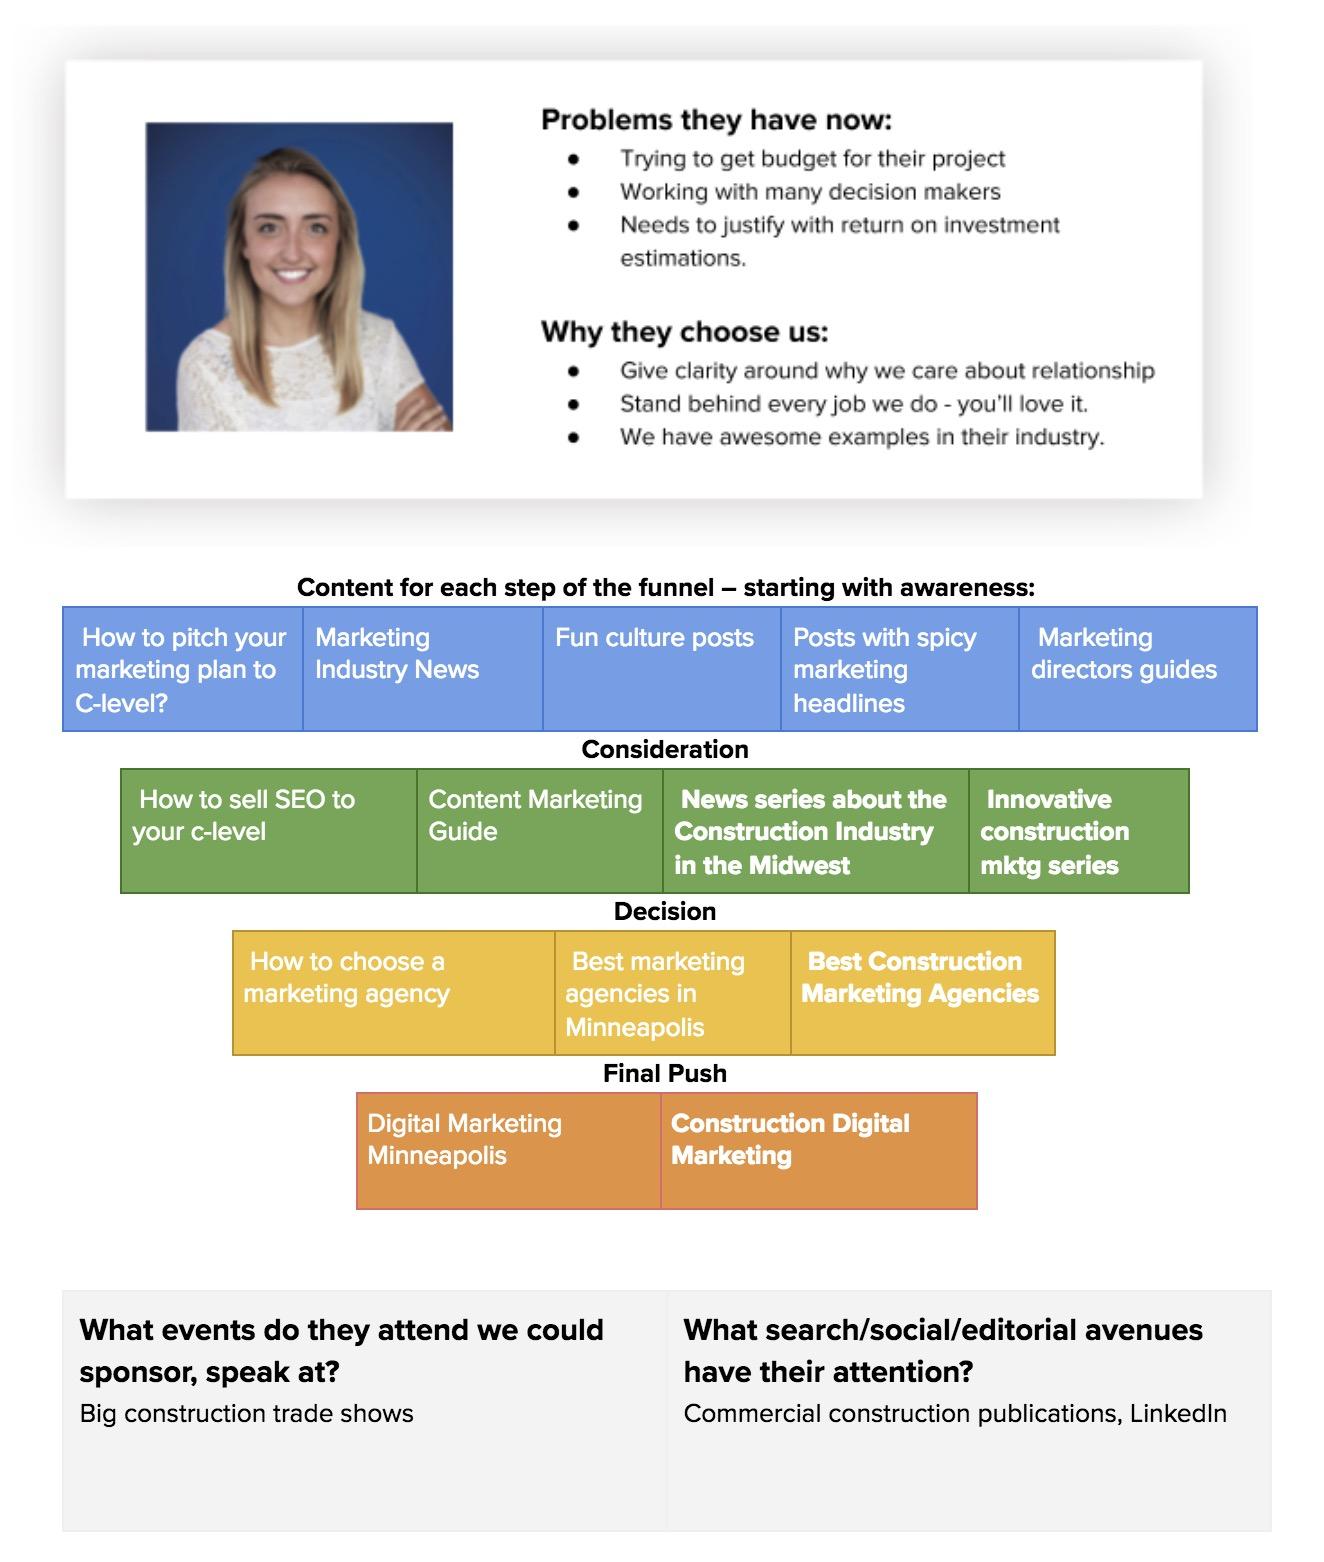 Ideal Marketing Manager Skills